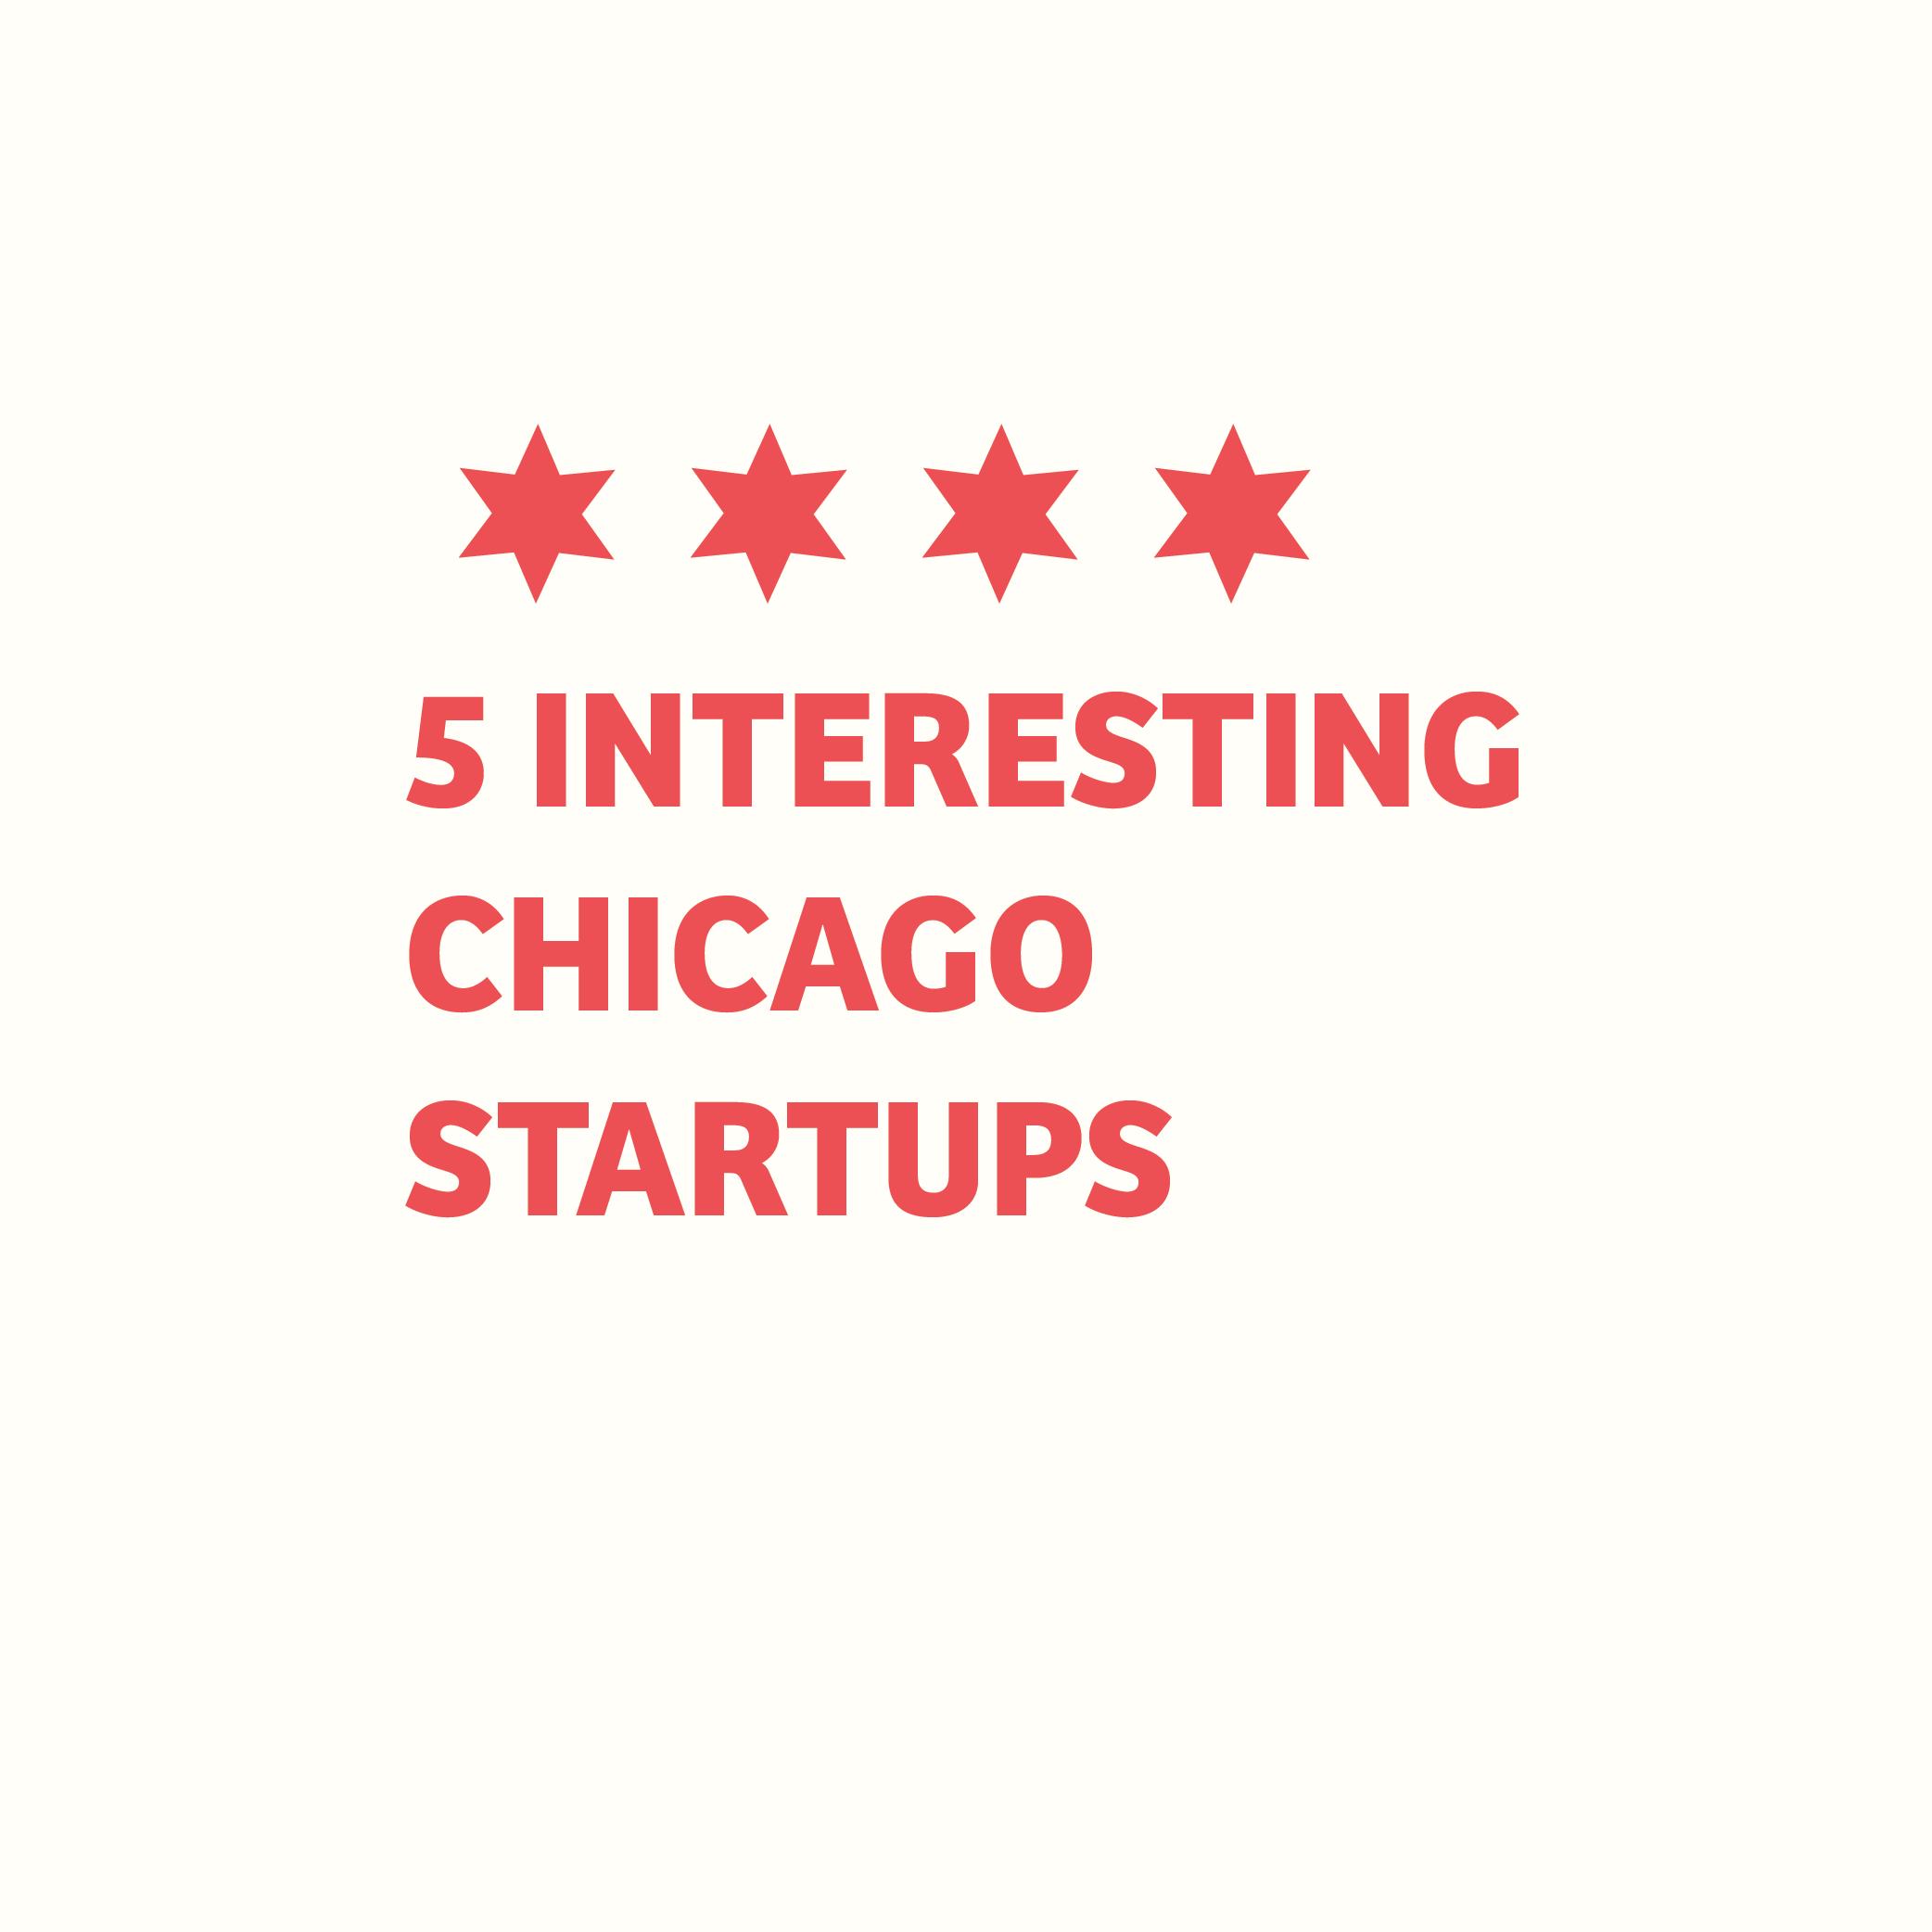 5-Interesting-Chicago-Startups